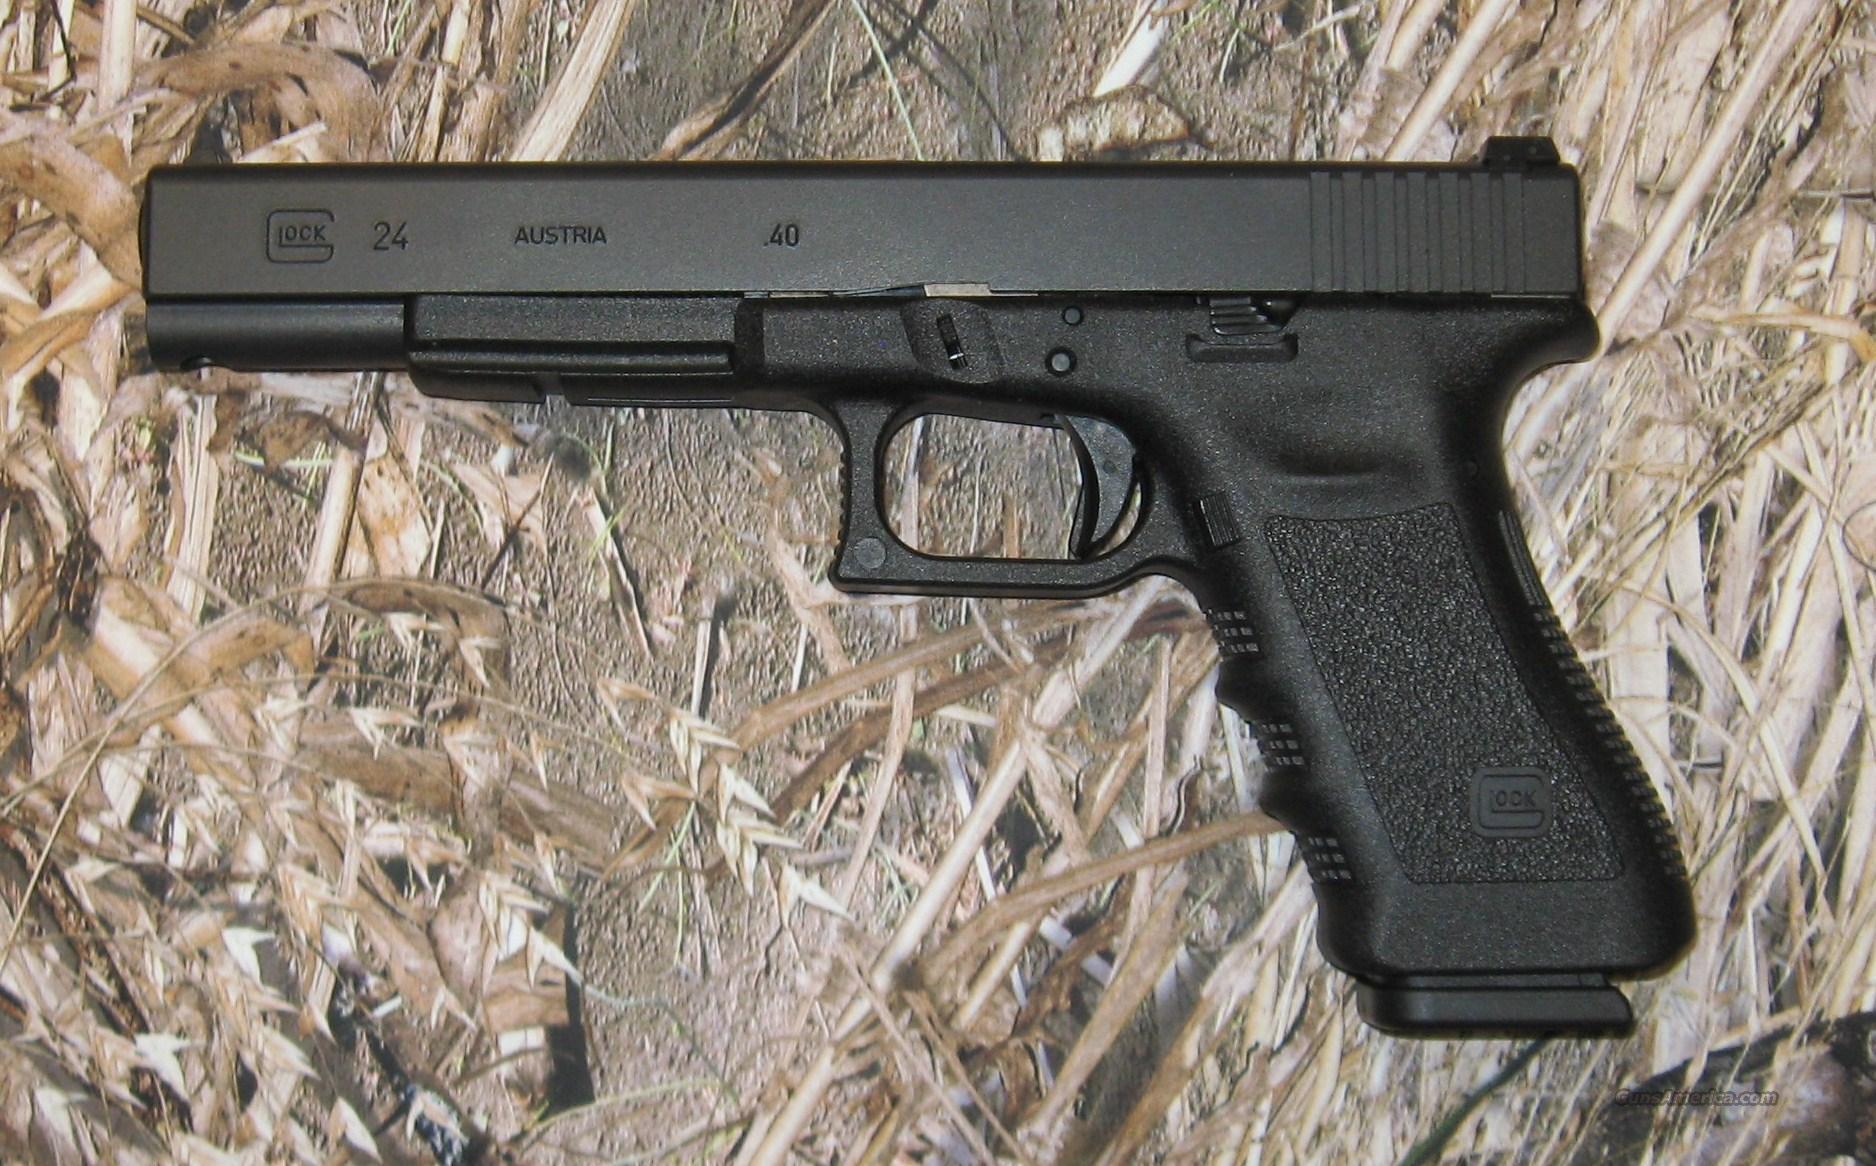 Glock 24  Guns > Pistols > Glock Pistols > 24